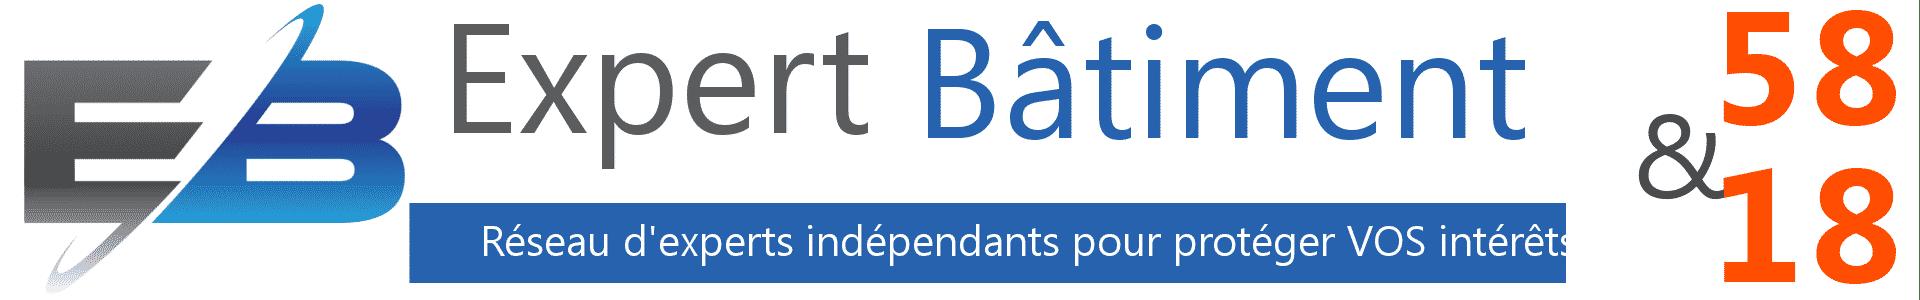 logo expert batiment 58, logo expertise batiment Nevers, expert indépendant Nièvre, expert indépendant 58,